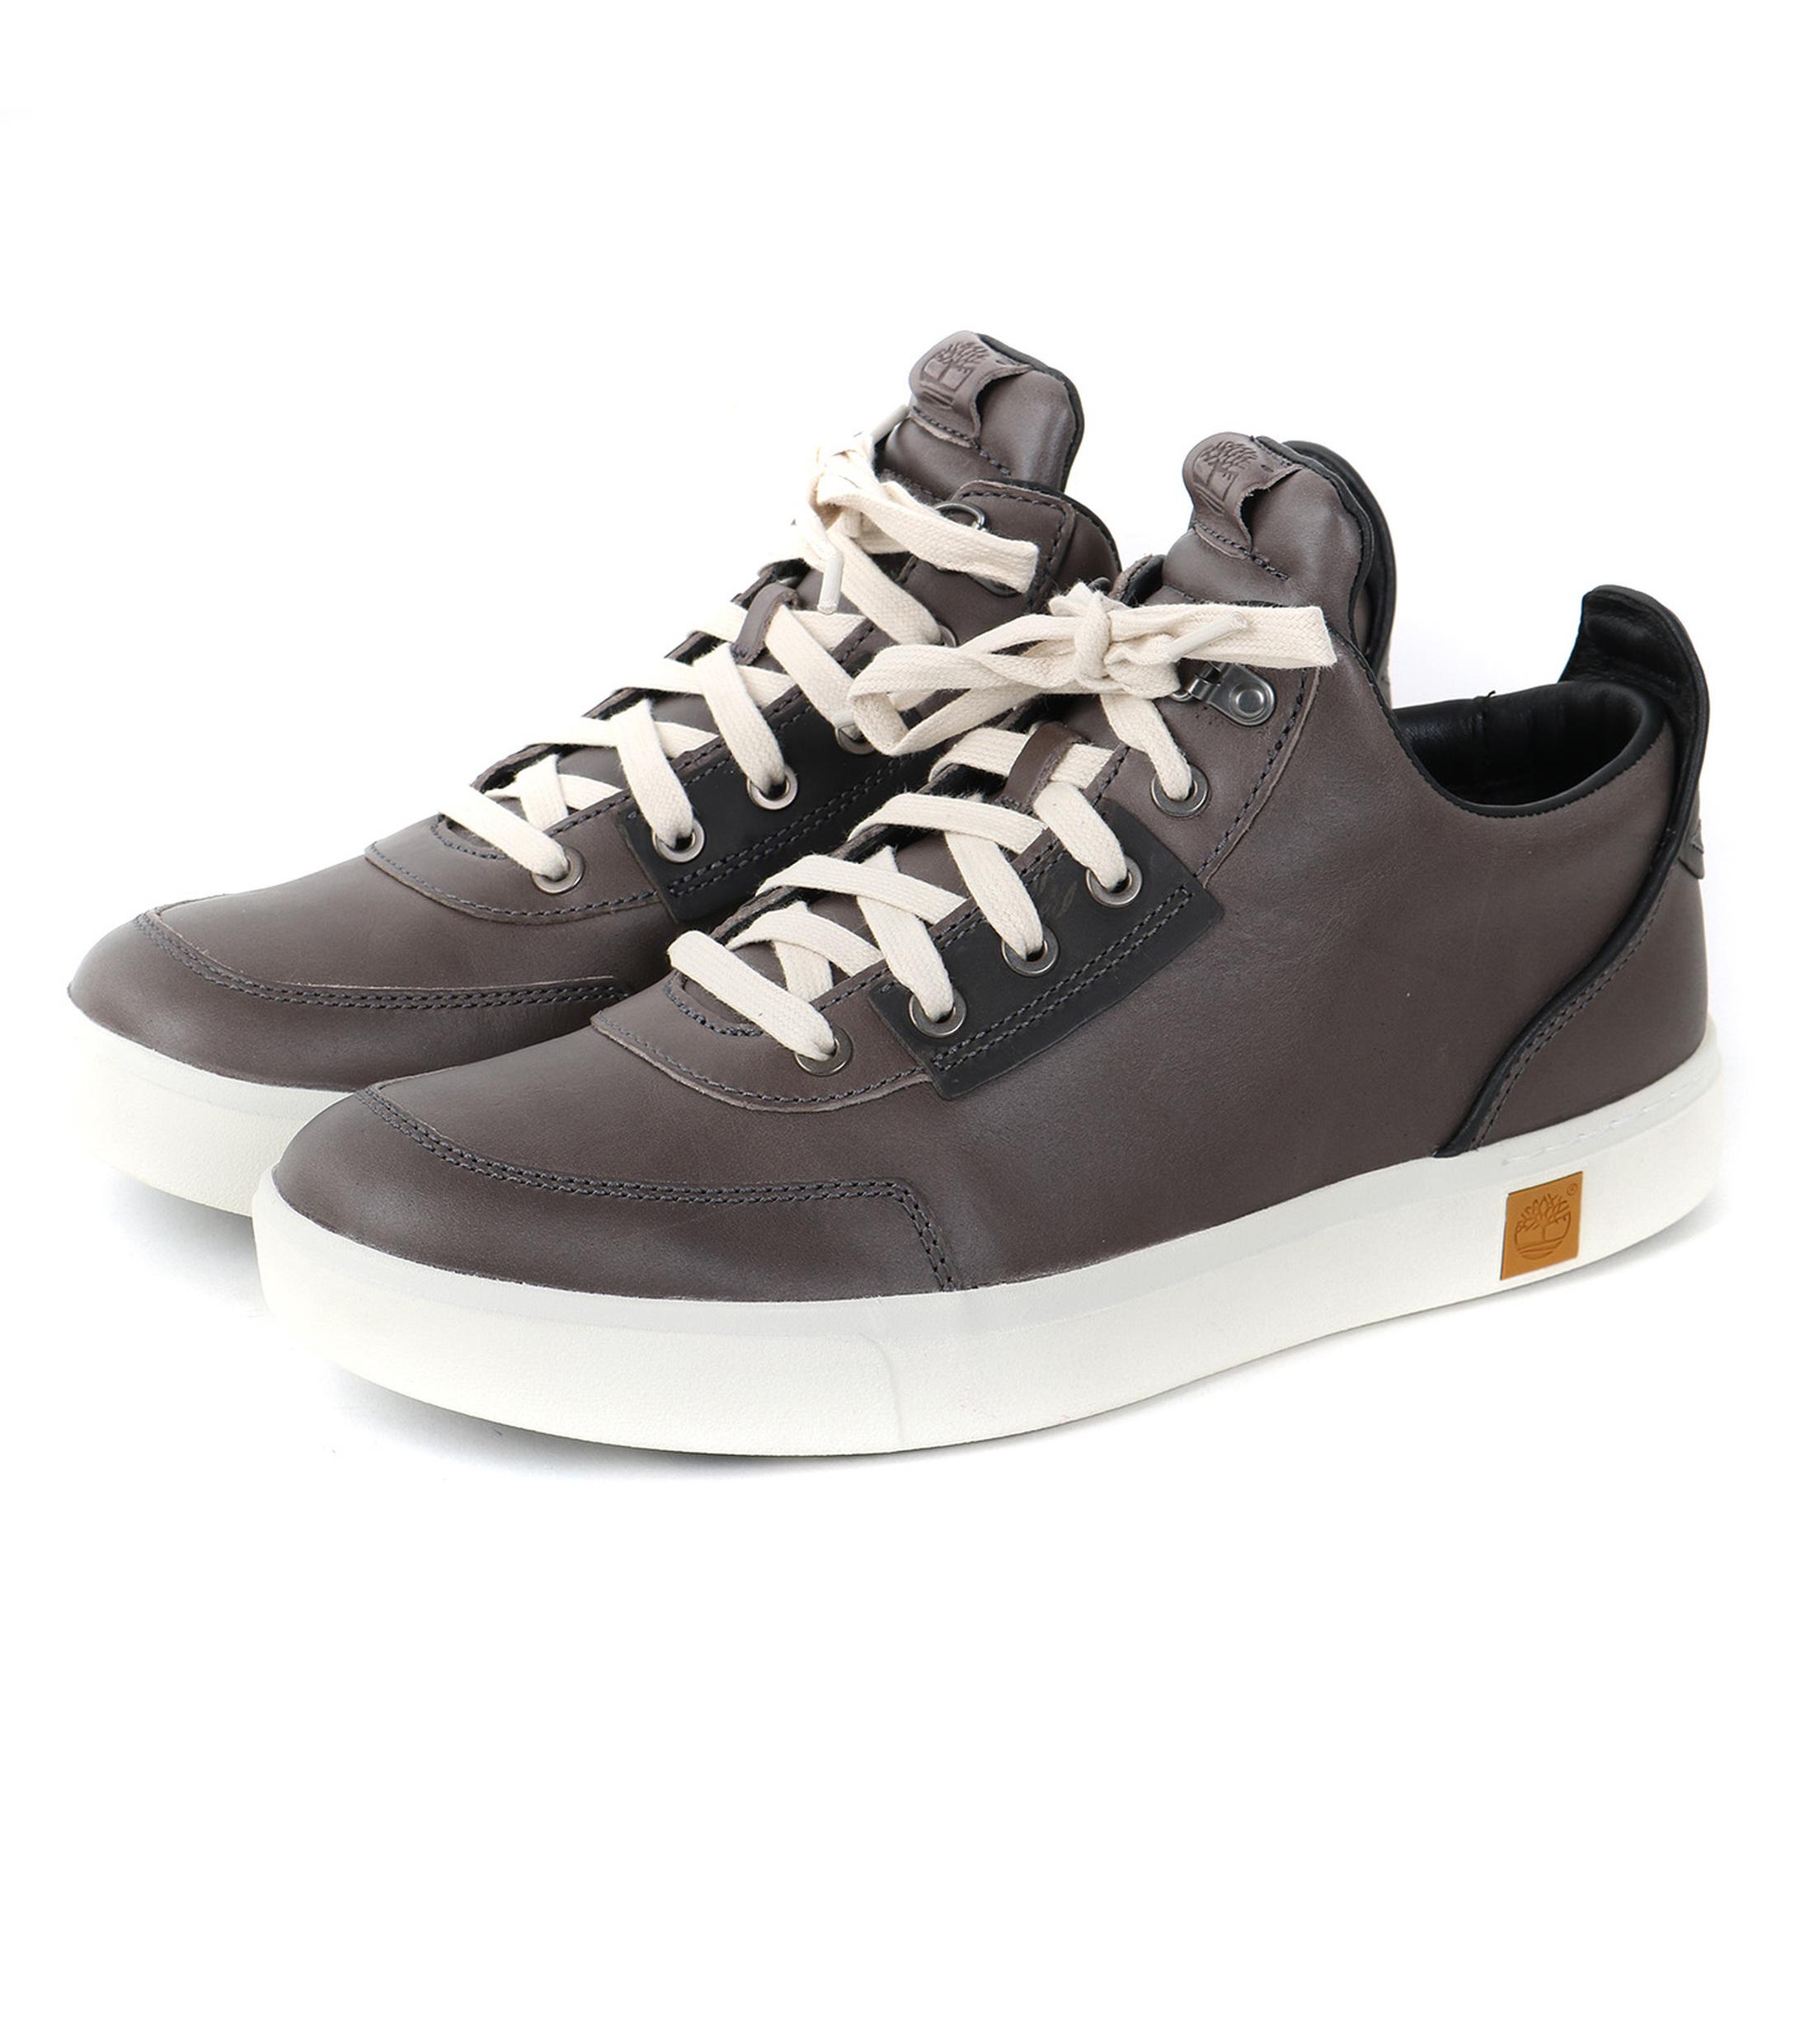 Timberland Gris Timberland Chaussures Chukka Amherst Haut Top cGWHbs